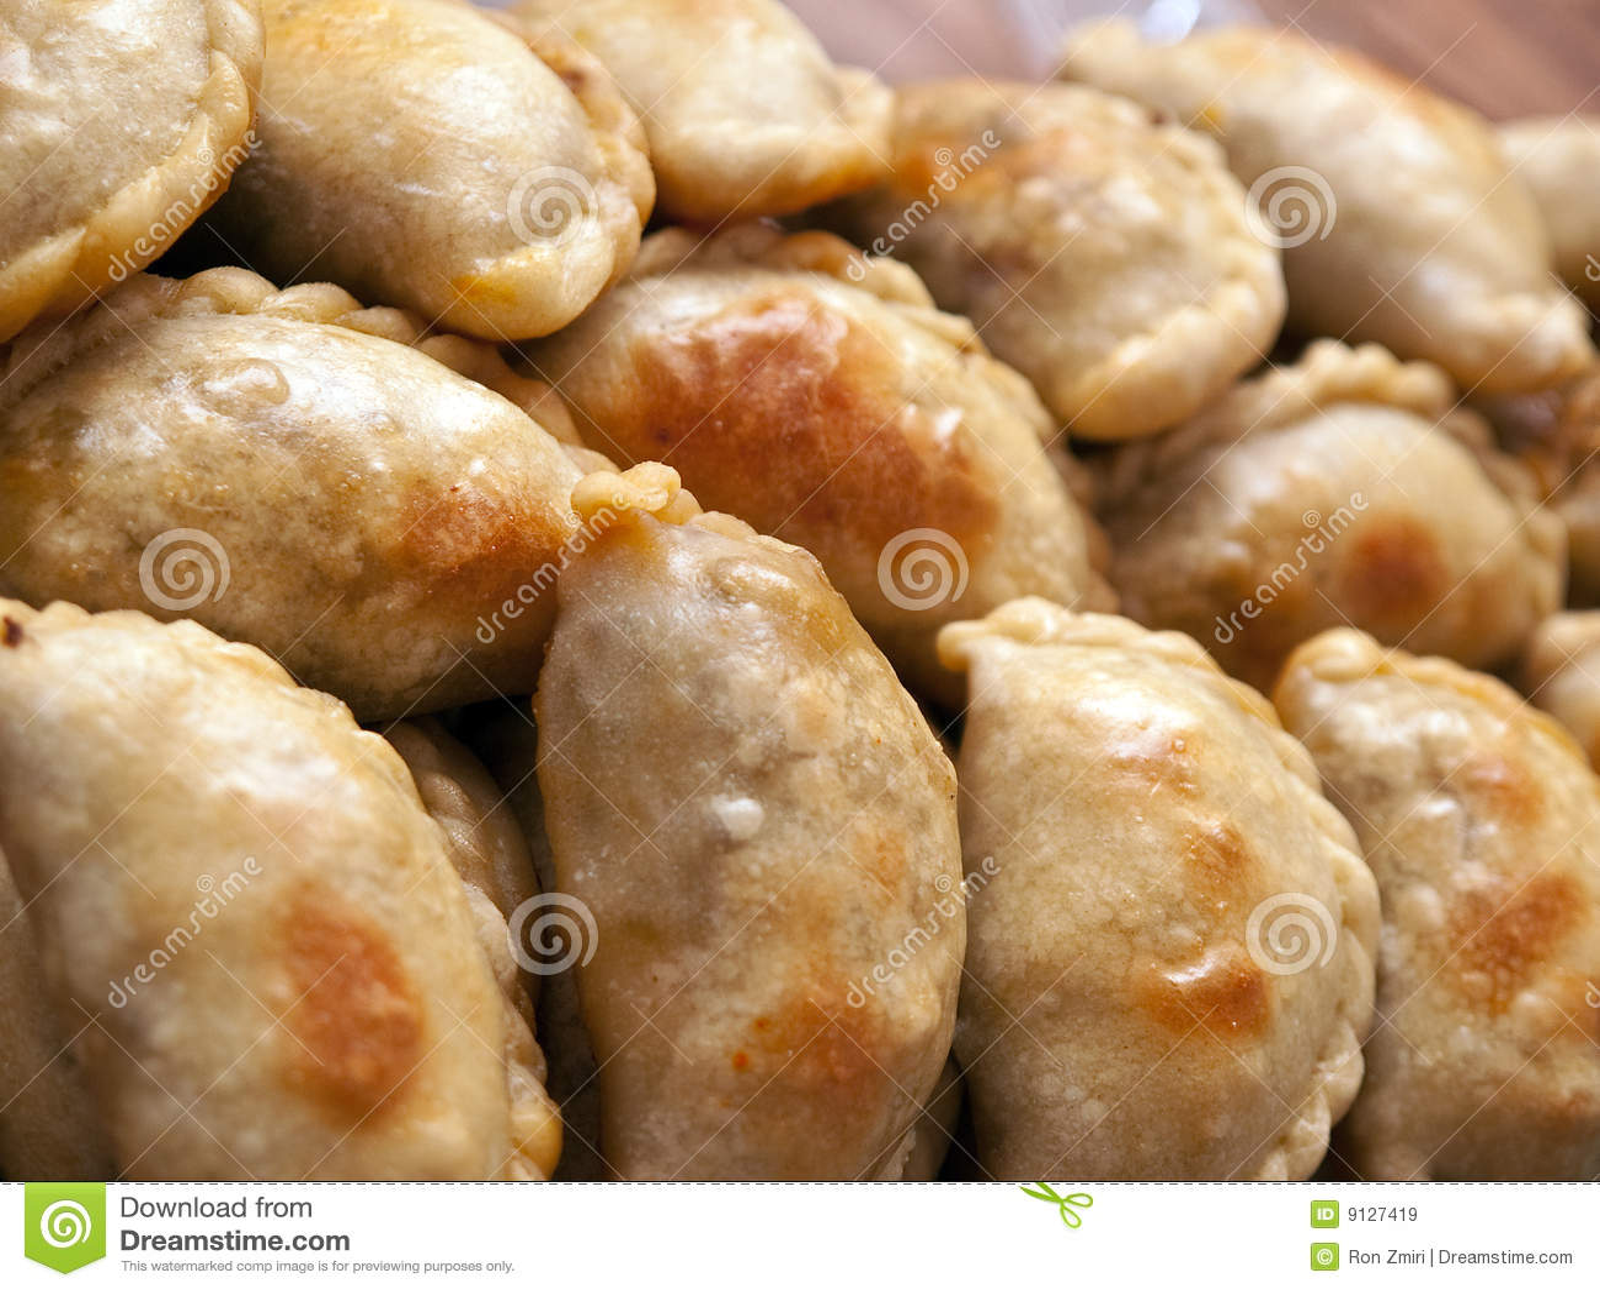 Fresh and crispy Argentine Empanadas